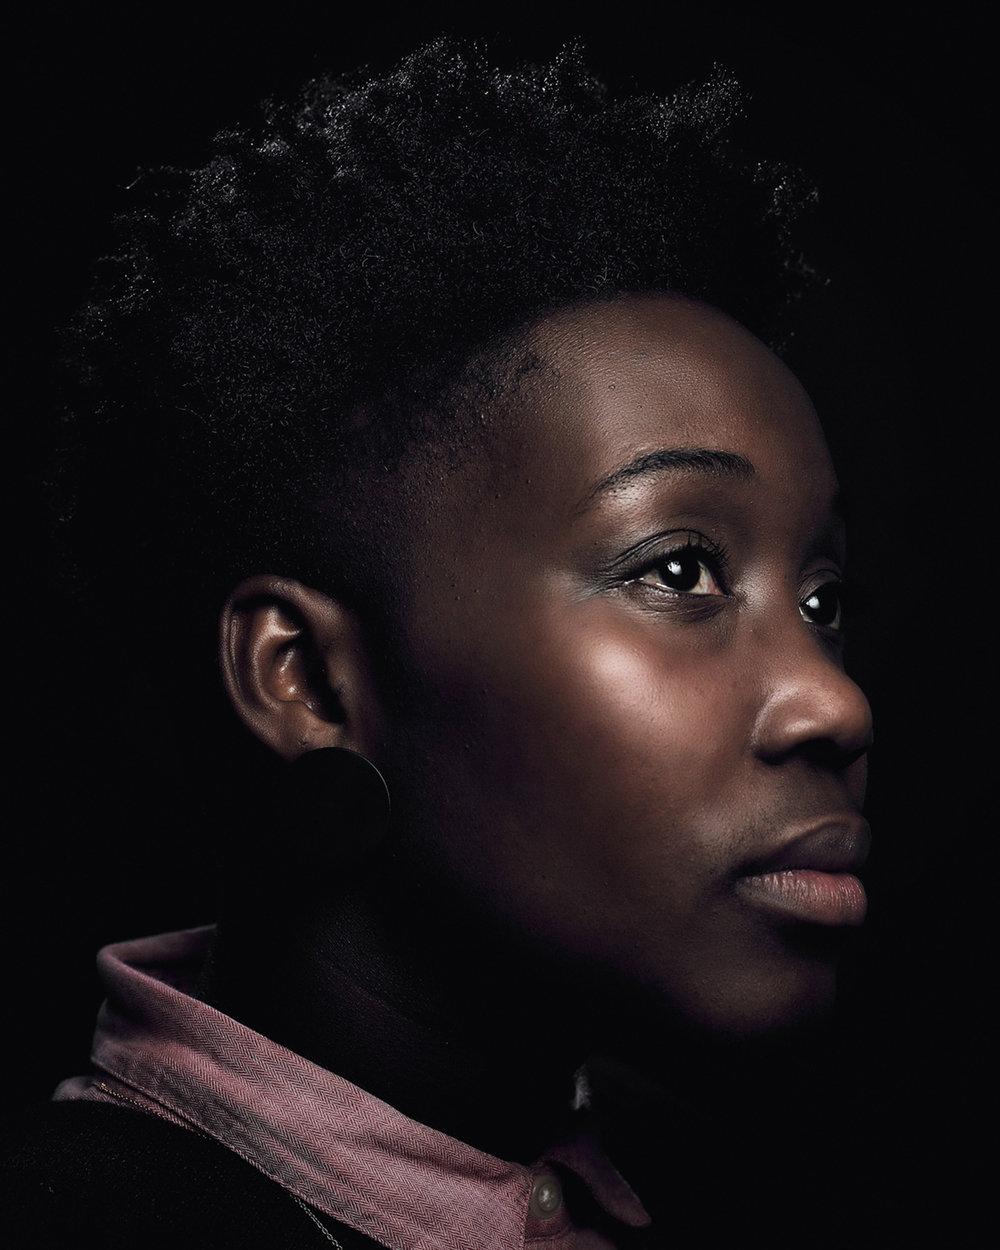 Matthew Joseph - portrait of woman profile